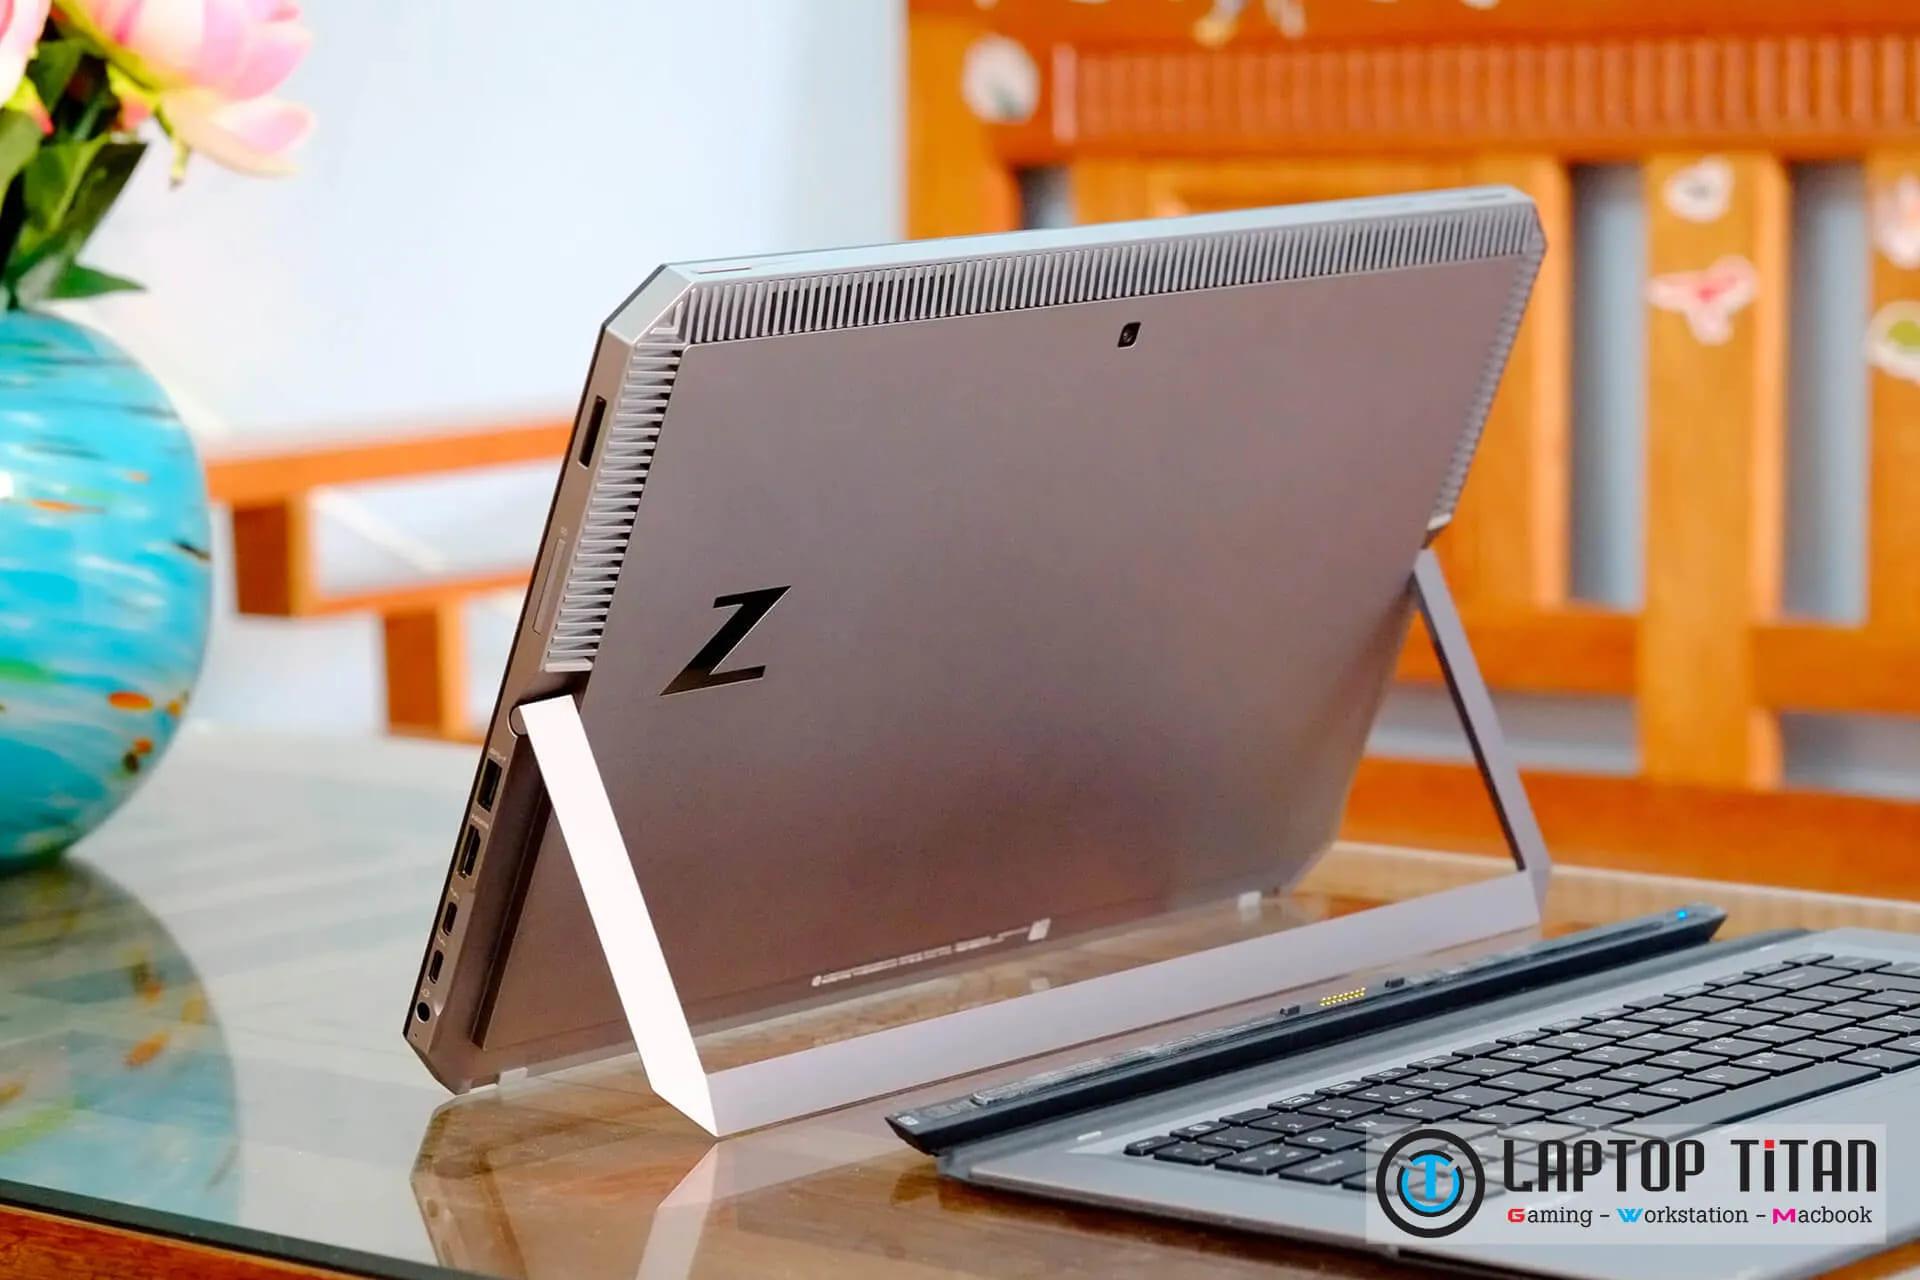 Hp Zbook X2 G4 Laptoptitan 010